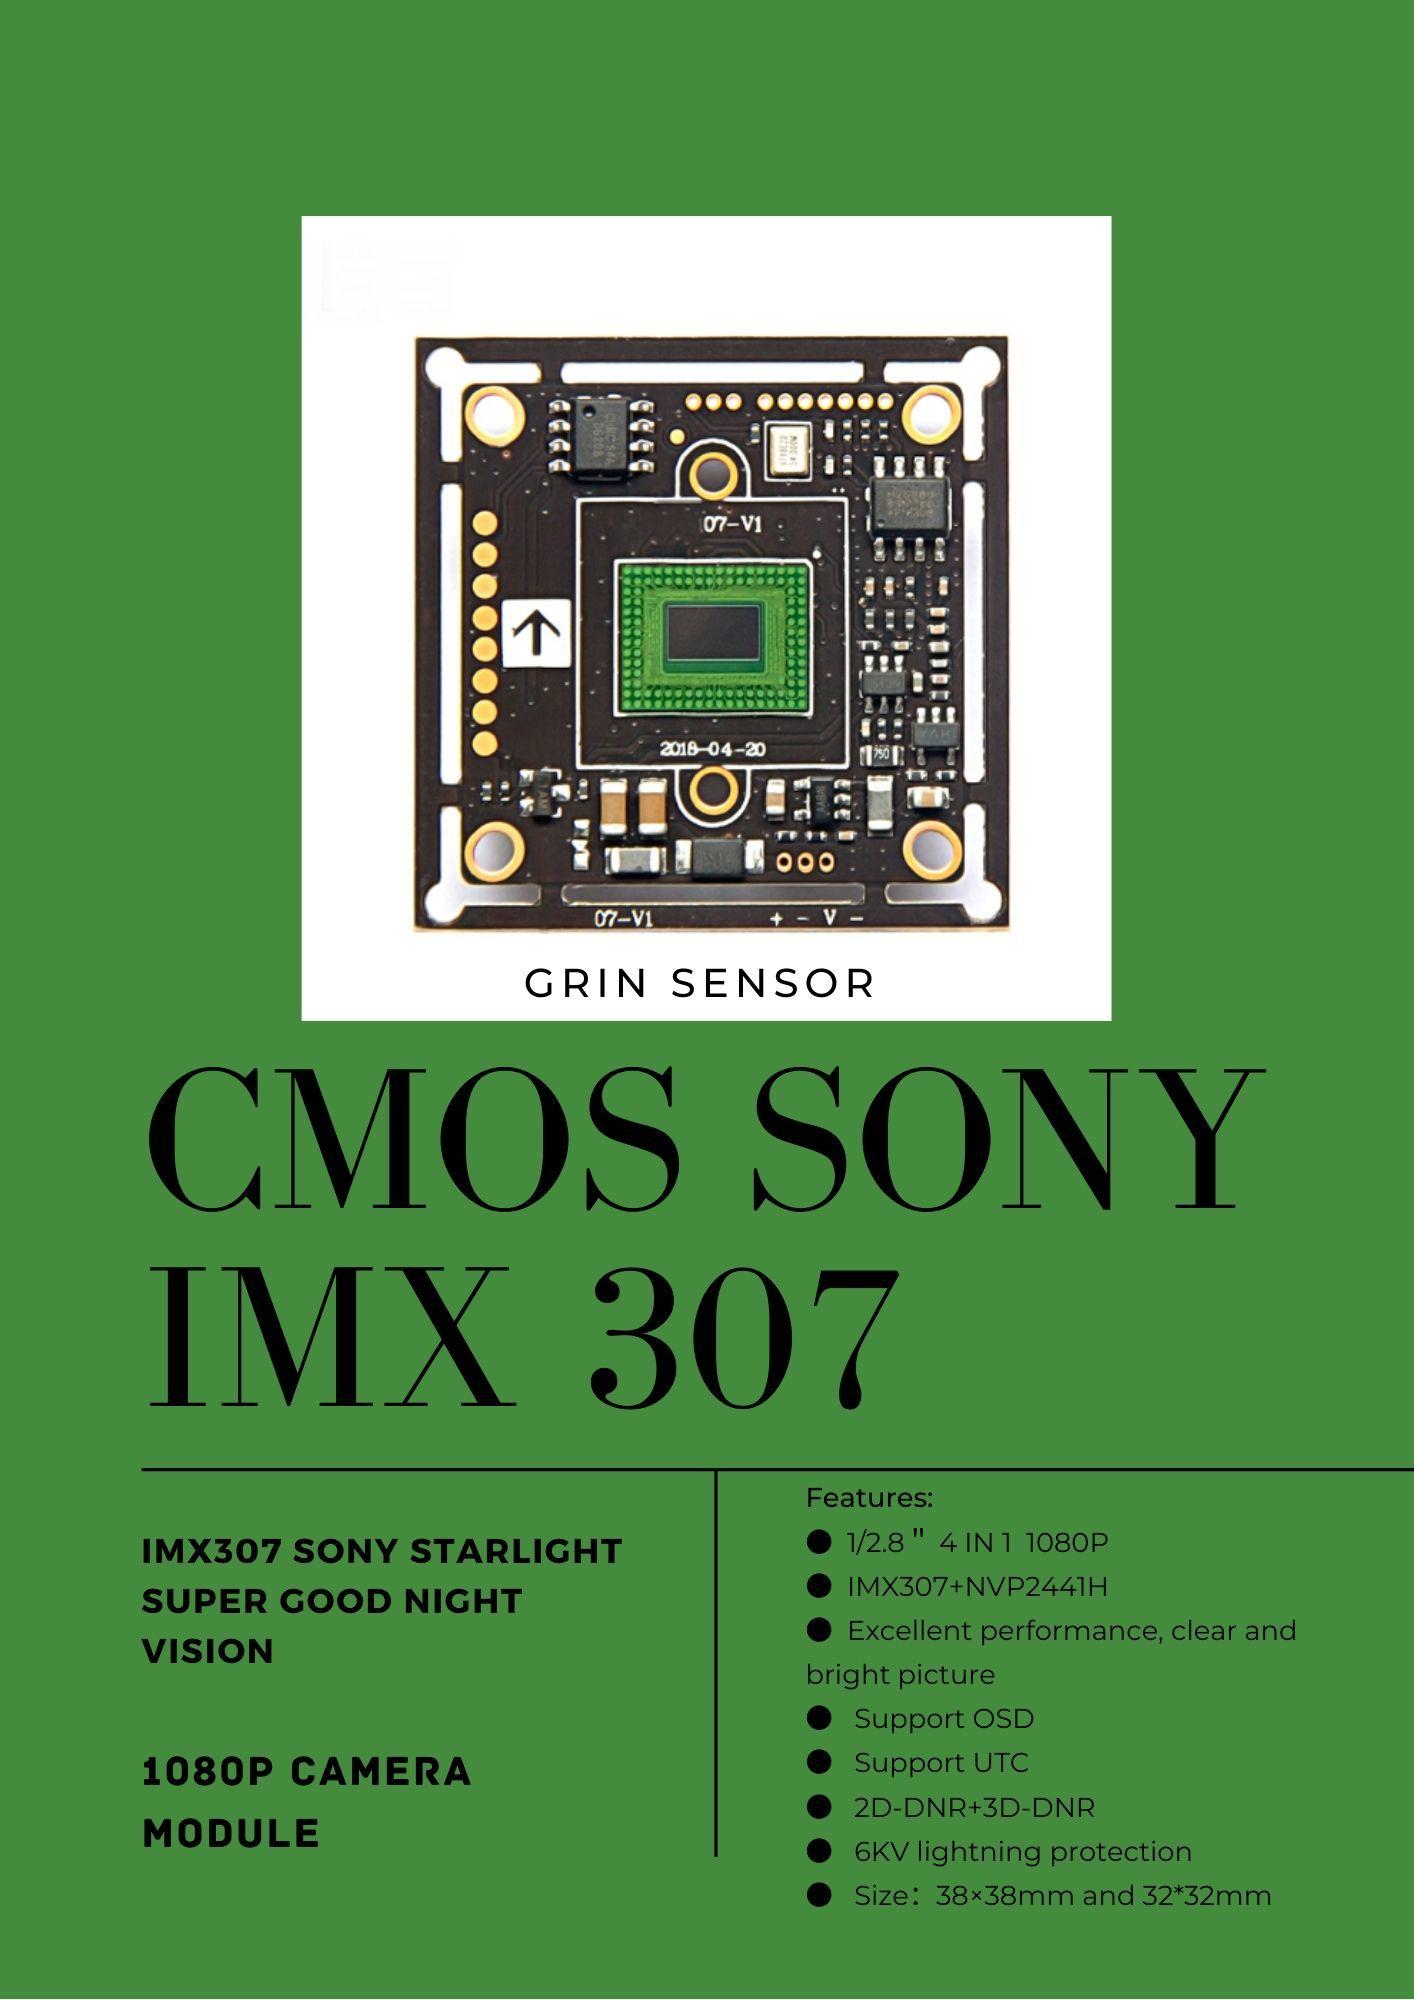 CMOS SONY IMX 307 GRIN SENSOR